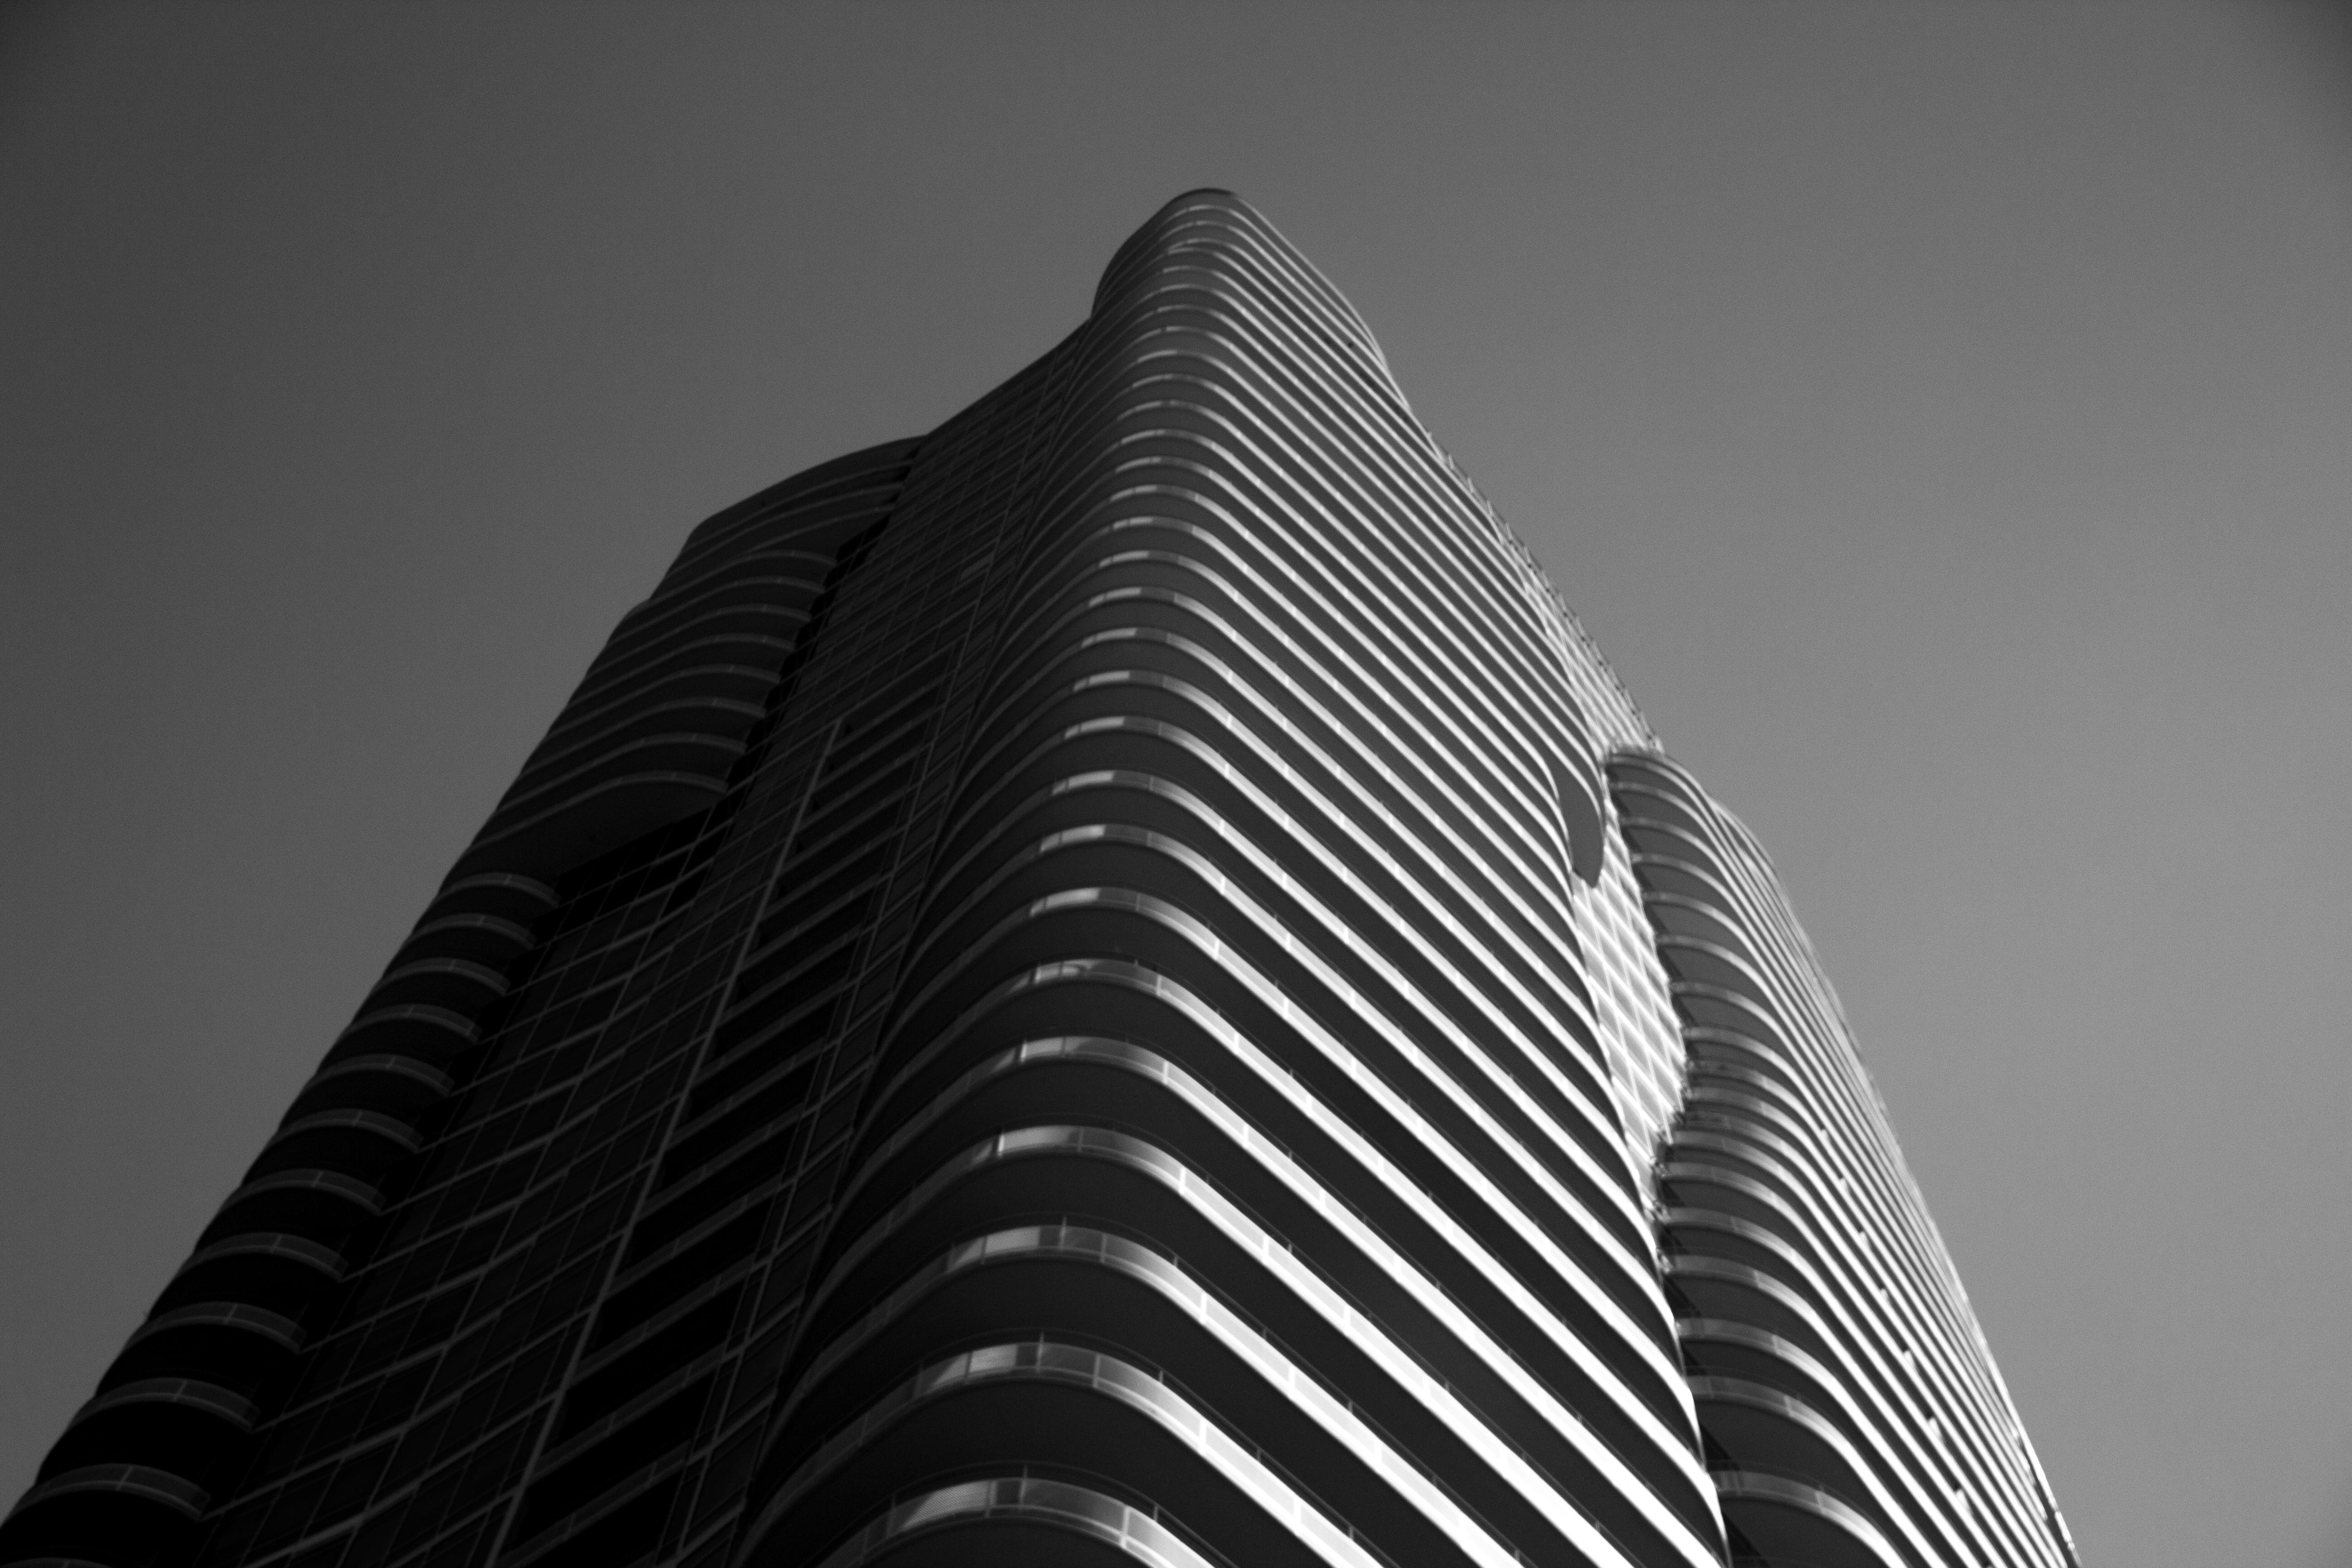 B&W Building 2